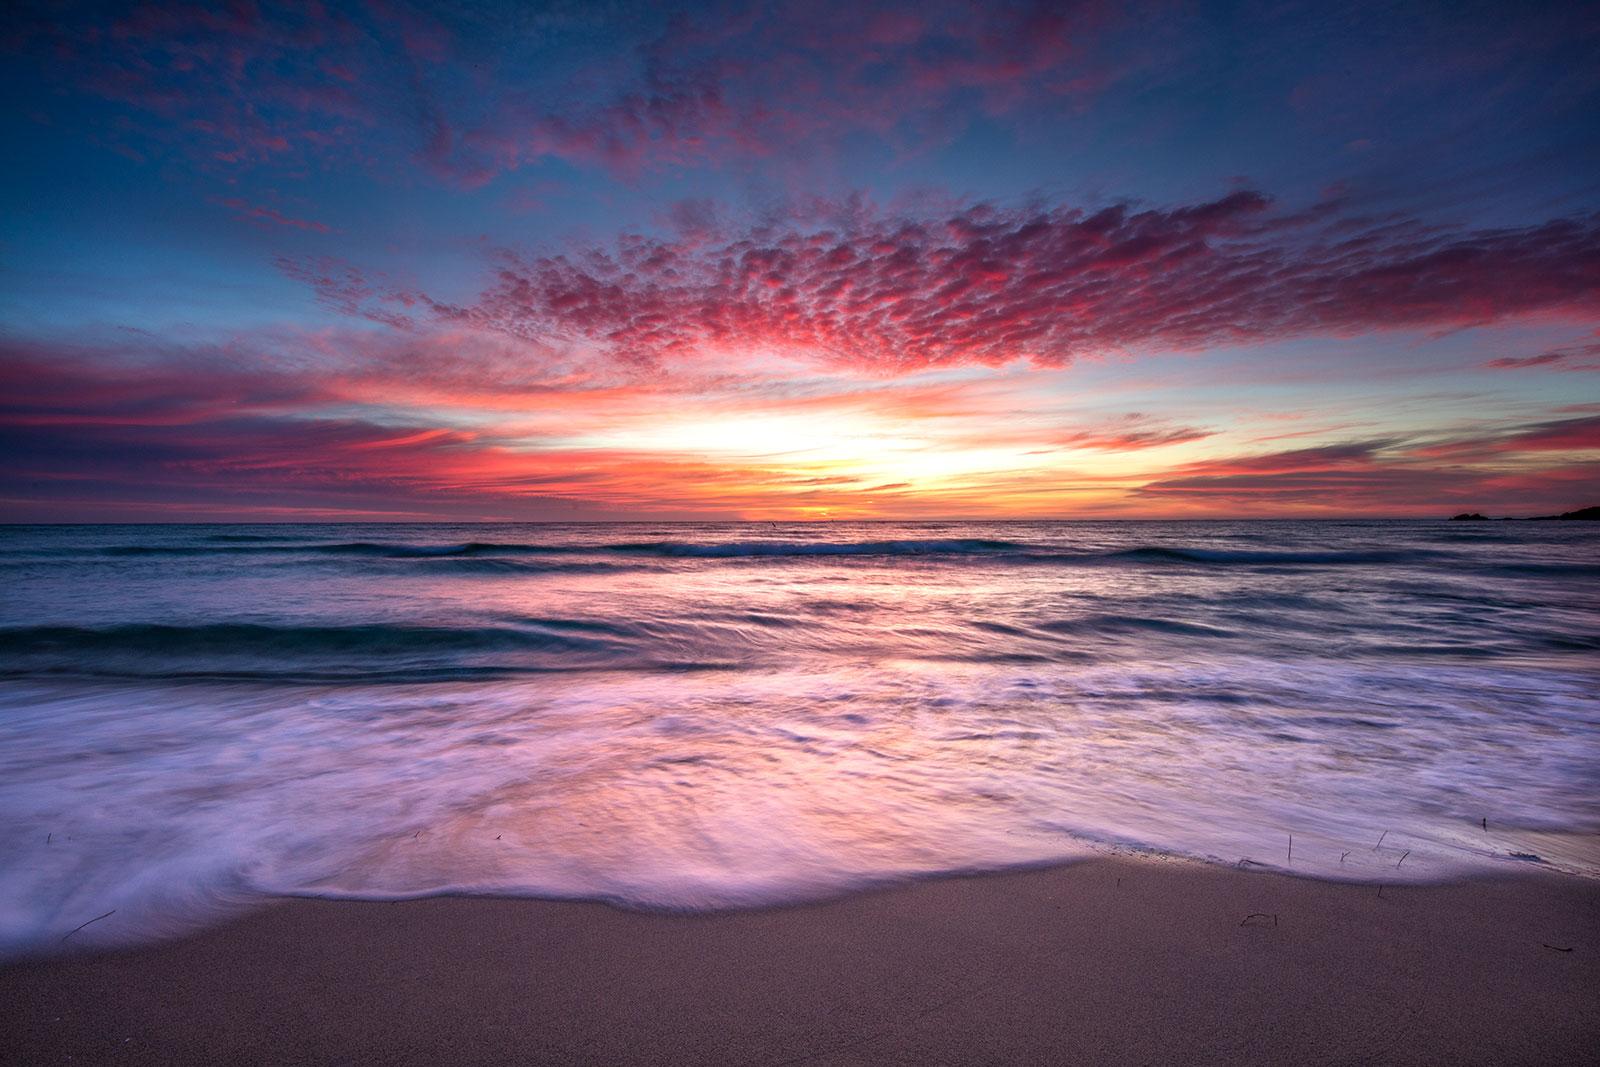 Ocean Sunset - Sean Scott Photography